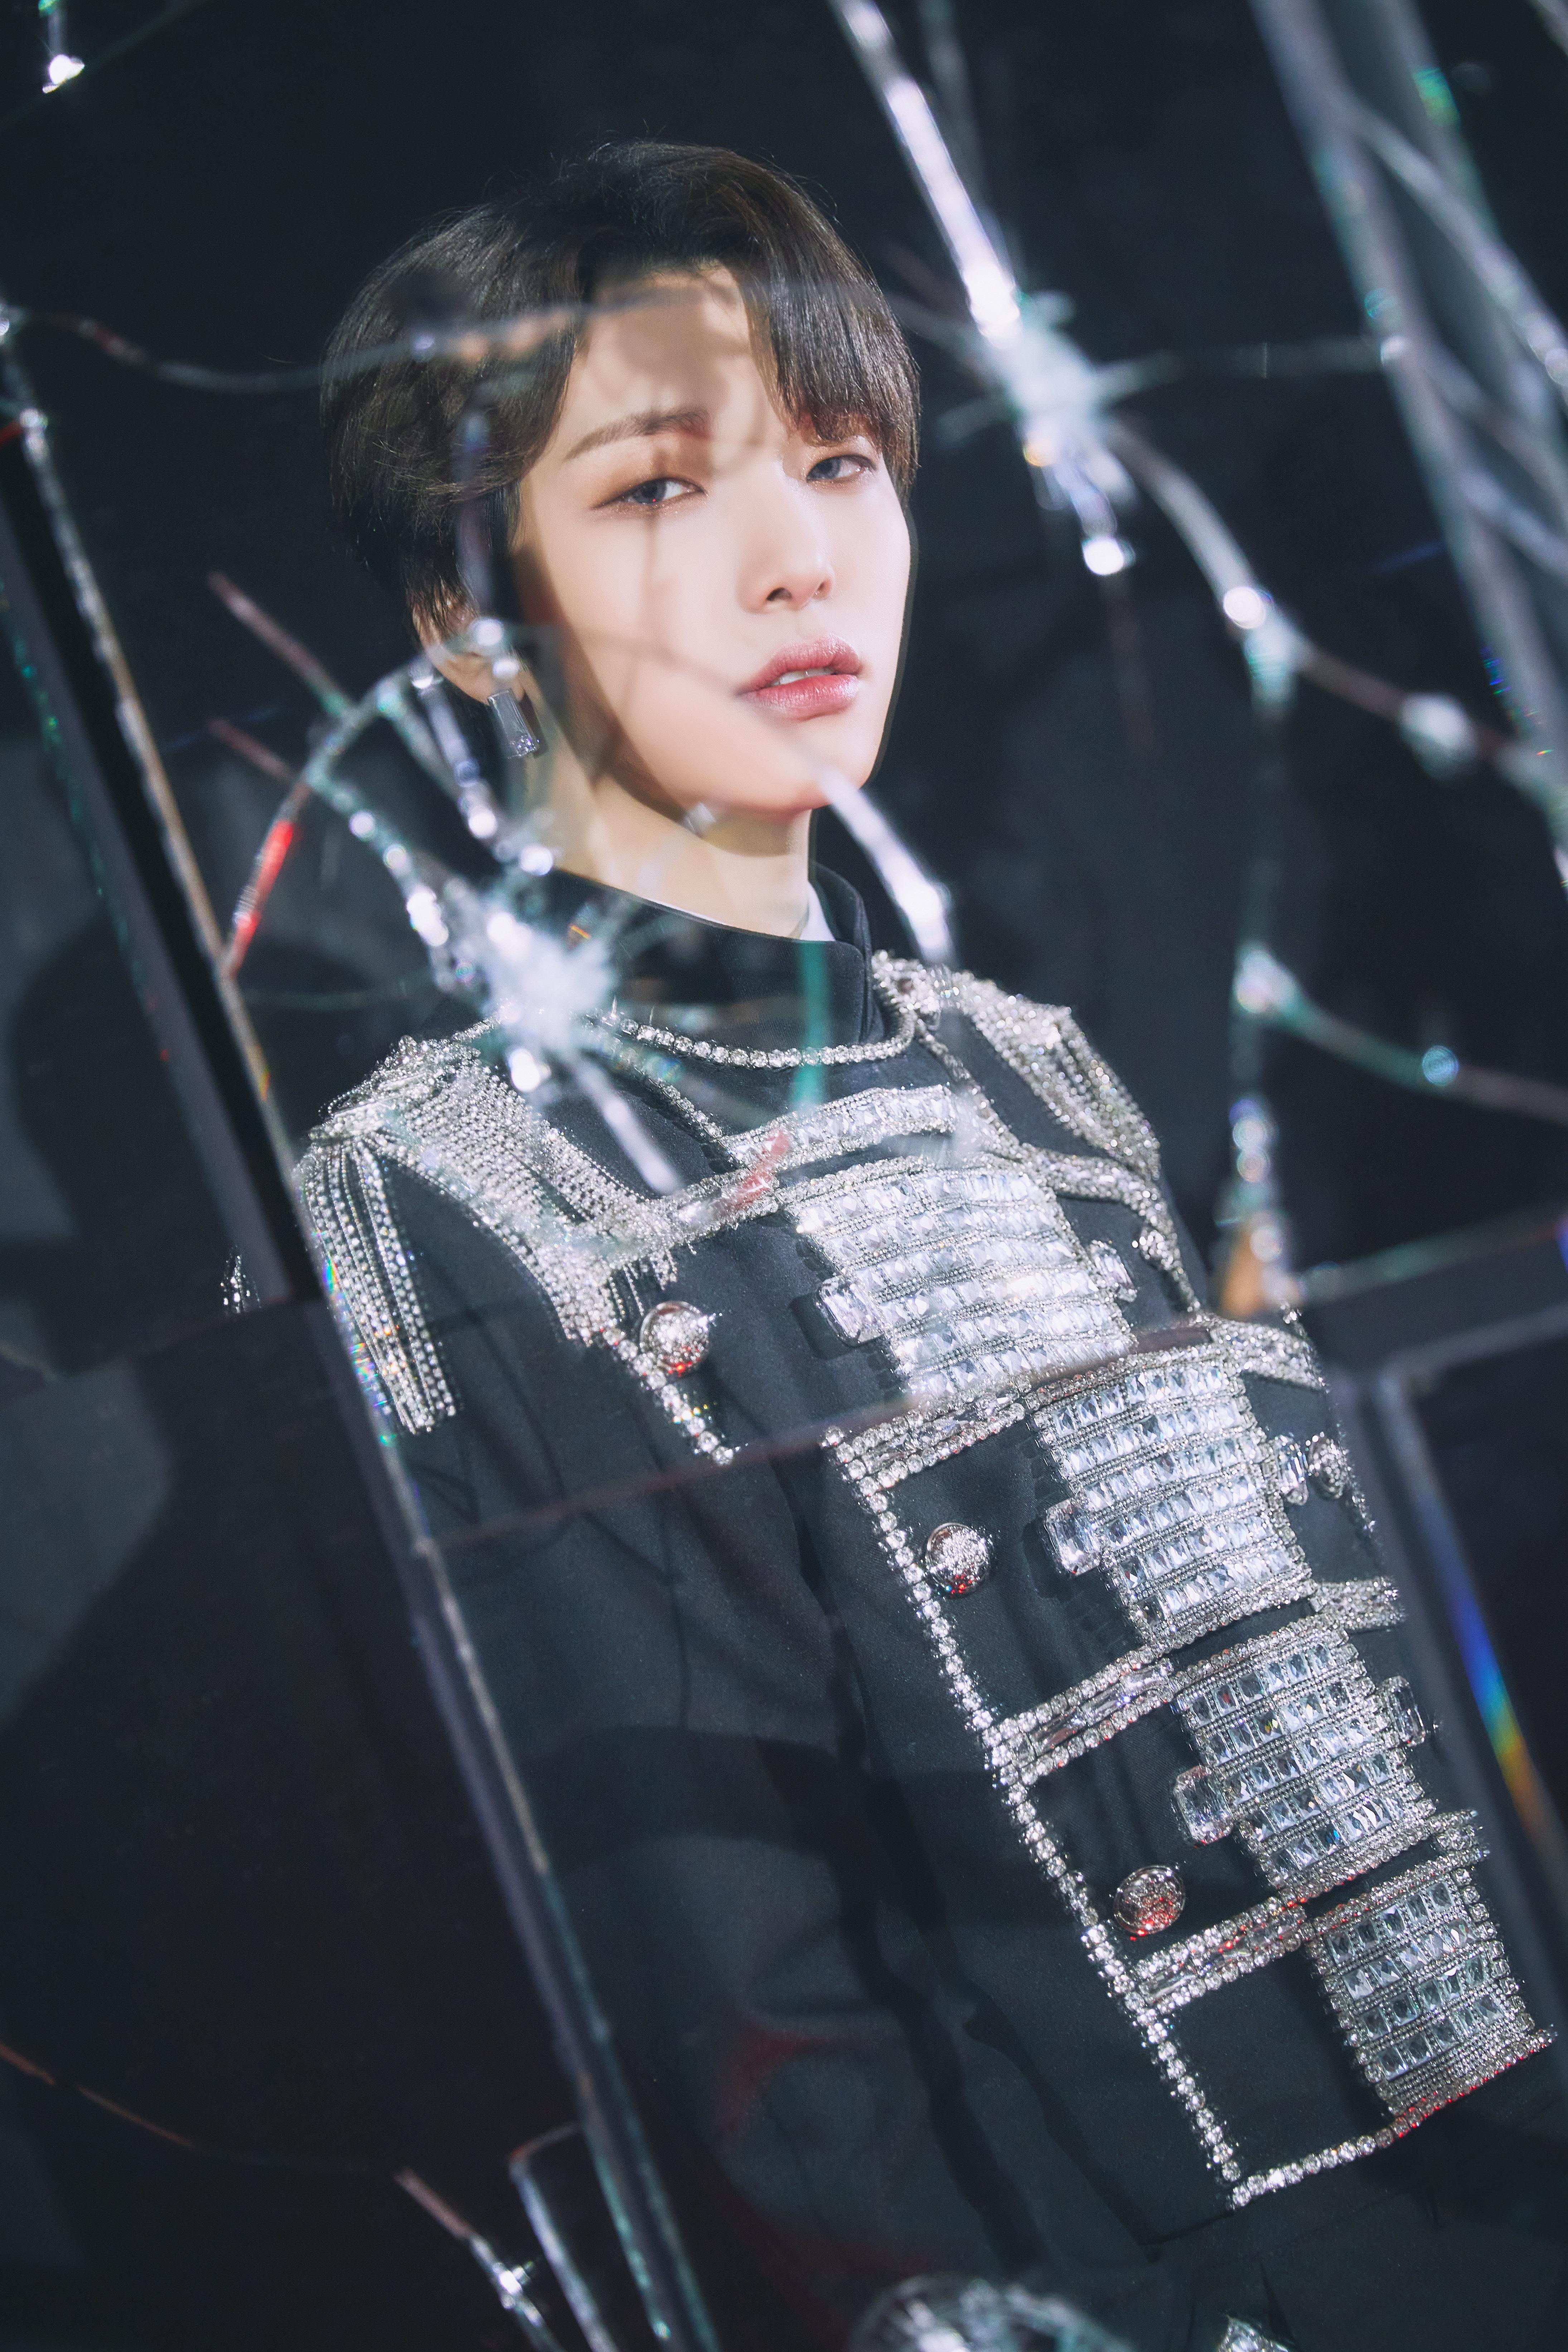 oneus_binary_code_black_mirror_concept_seoho